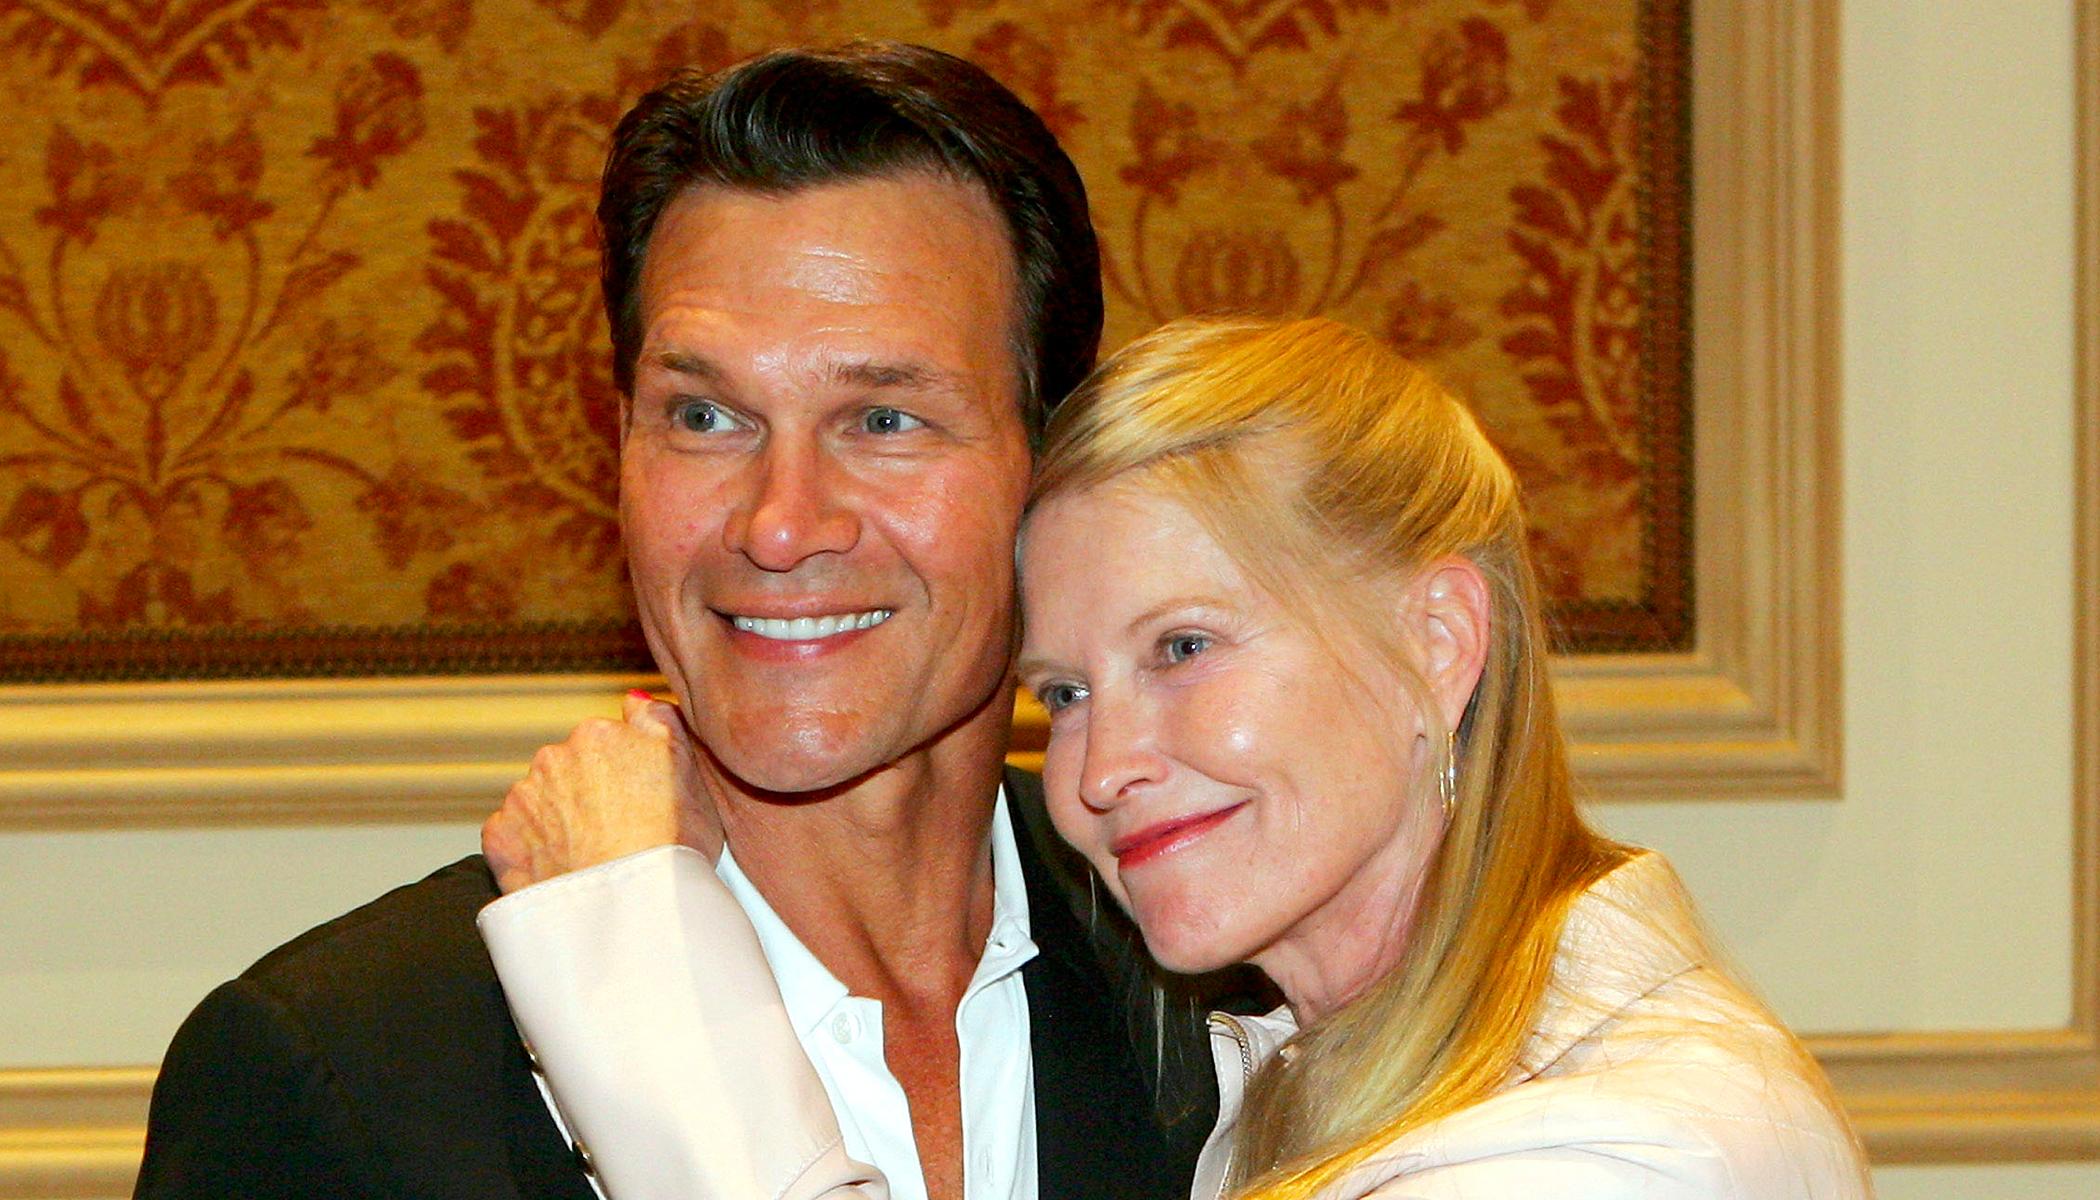 Patrick Swayze's Wife Remembers Her